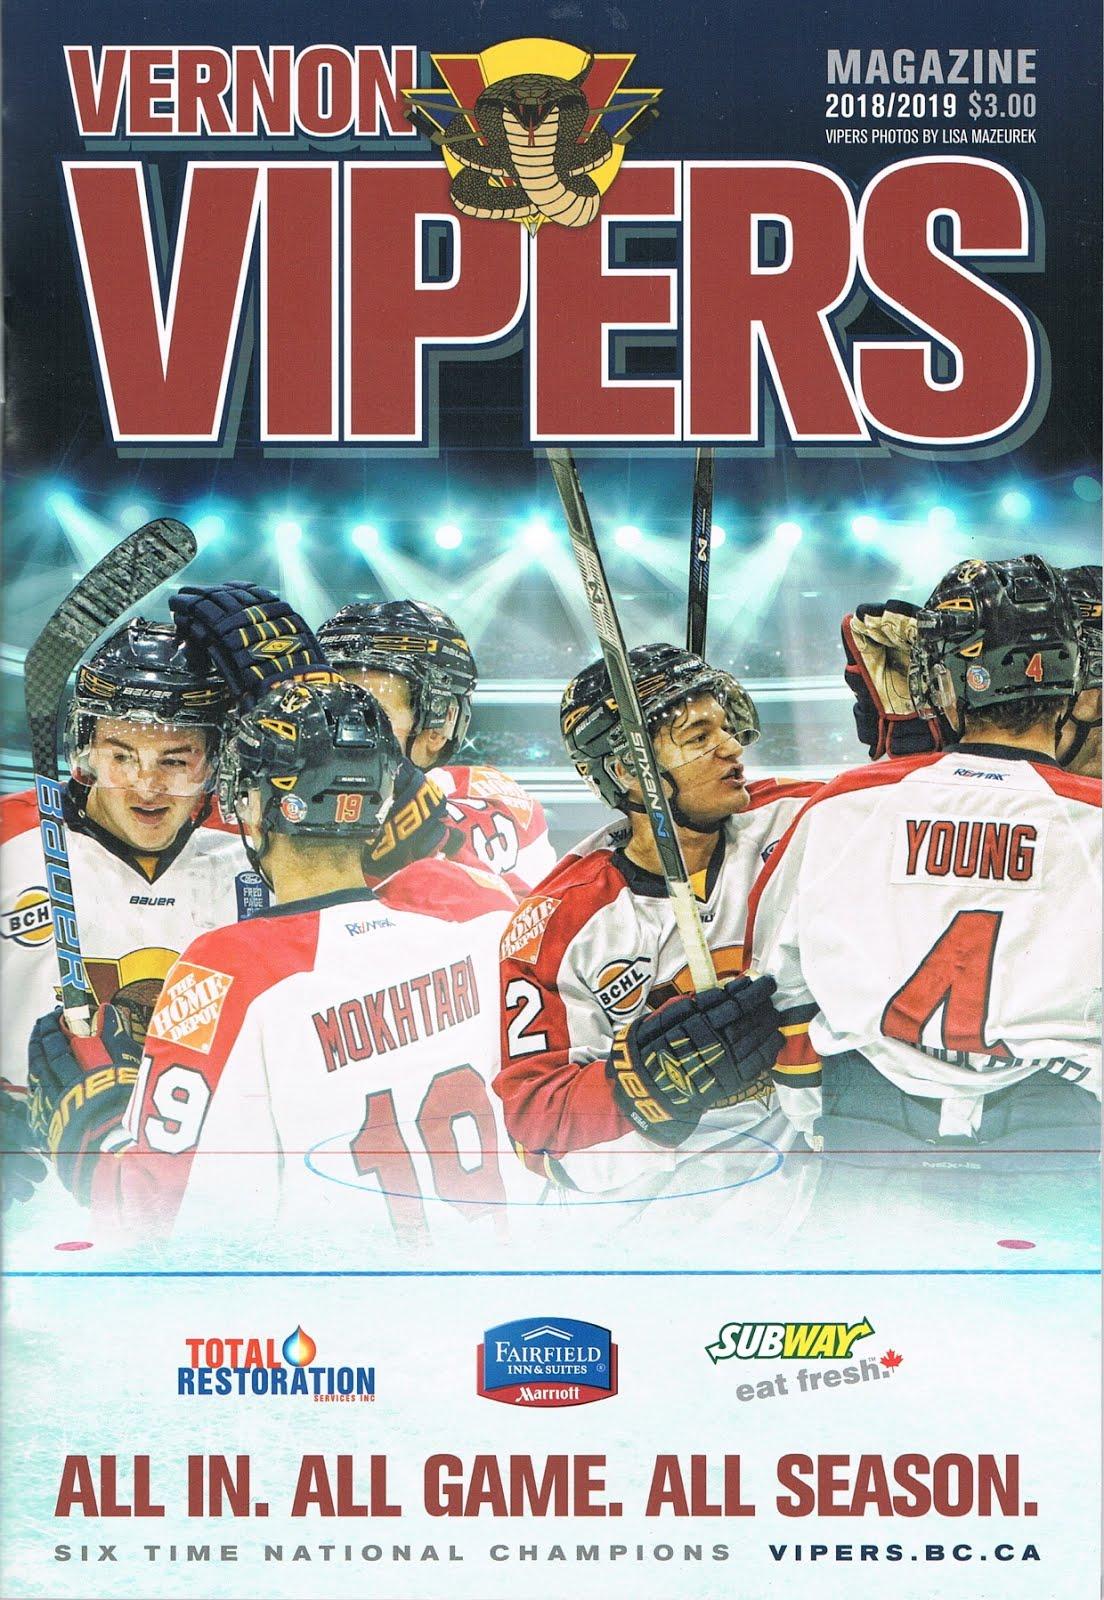 Vernon Vipers 2018-19 Program